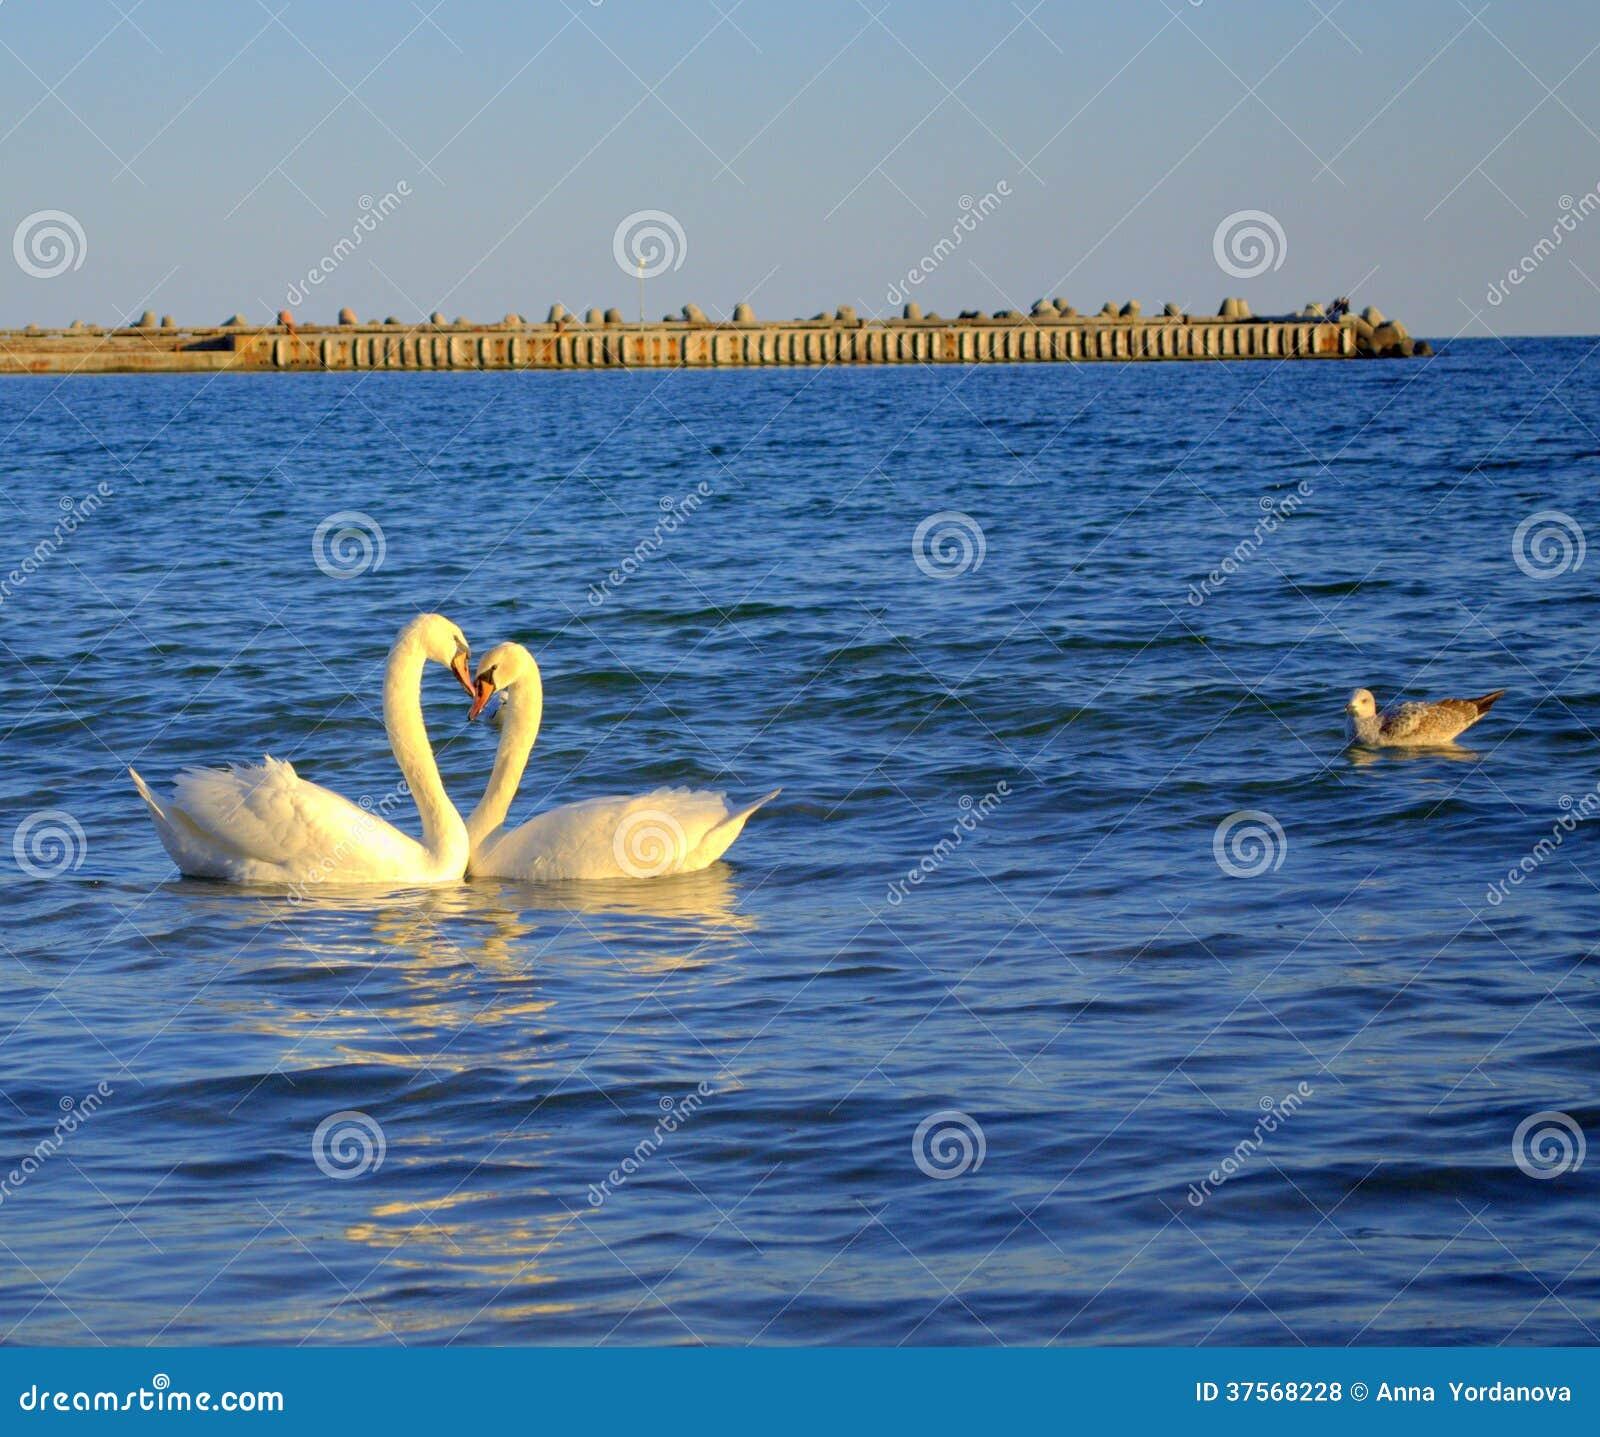 Lovely swans pair in sea